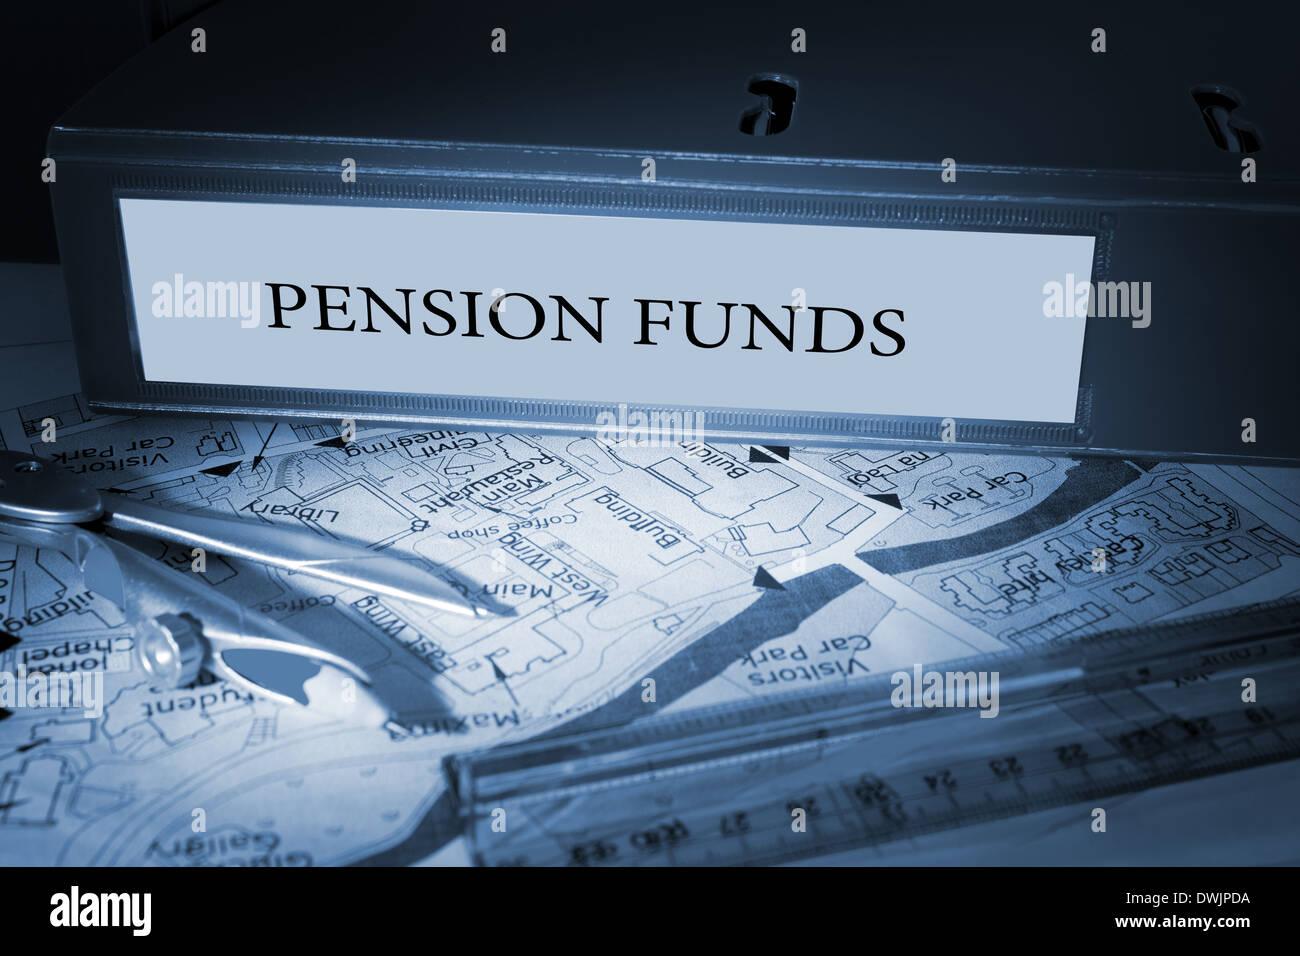 Pension funds on blue business binder - Stock Image